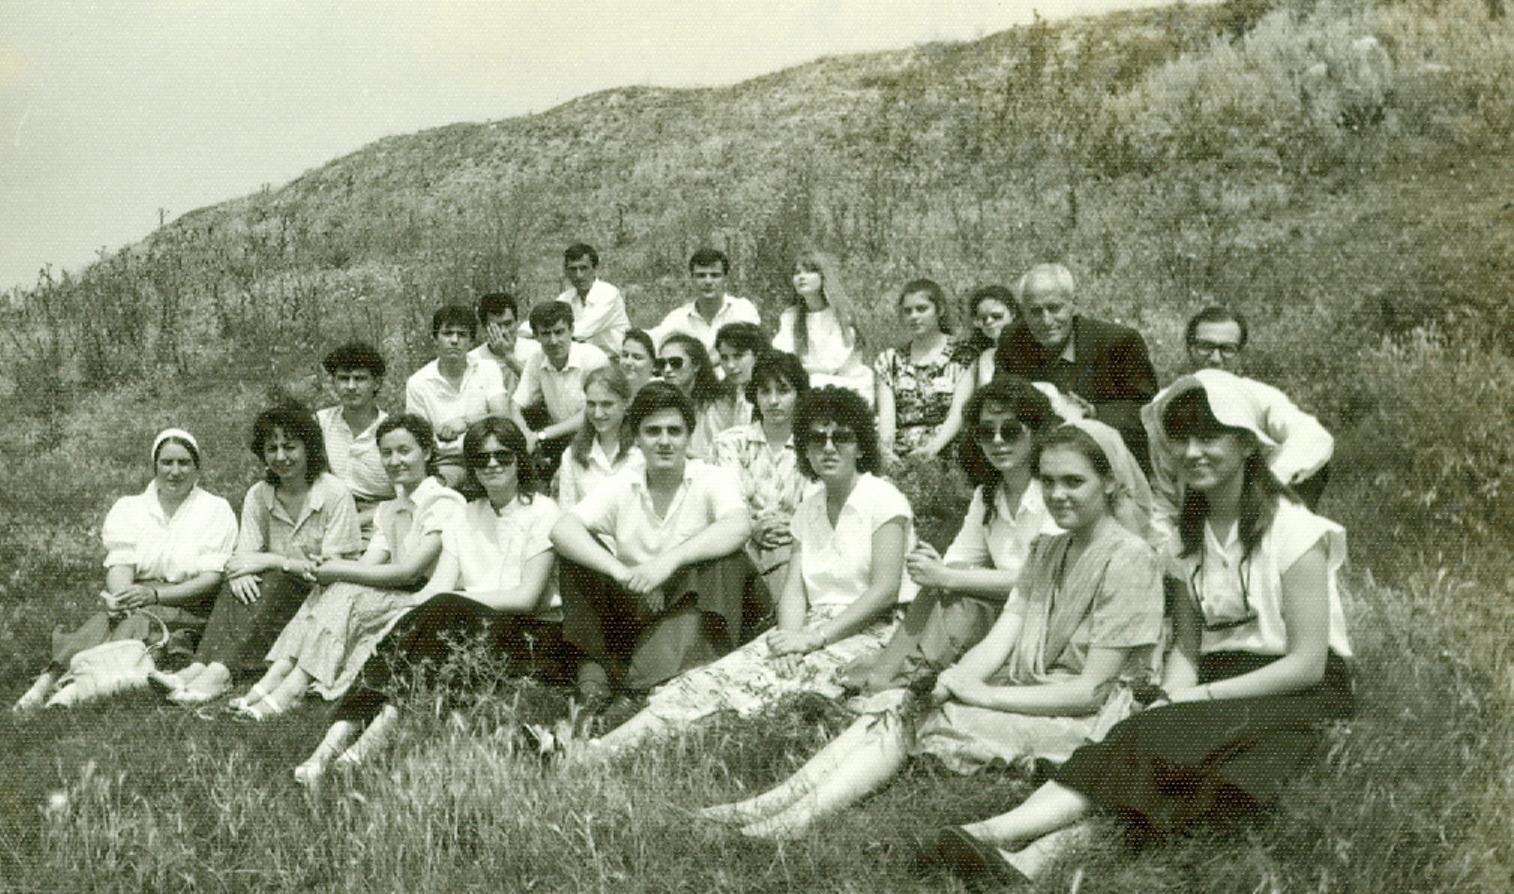 TINERI DIN BISERICA CRESTINA DUPA EVANGHELIE DRAGOS VODA BUCURESTI AFLATI LANGA GIURGIU 1990